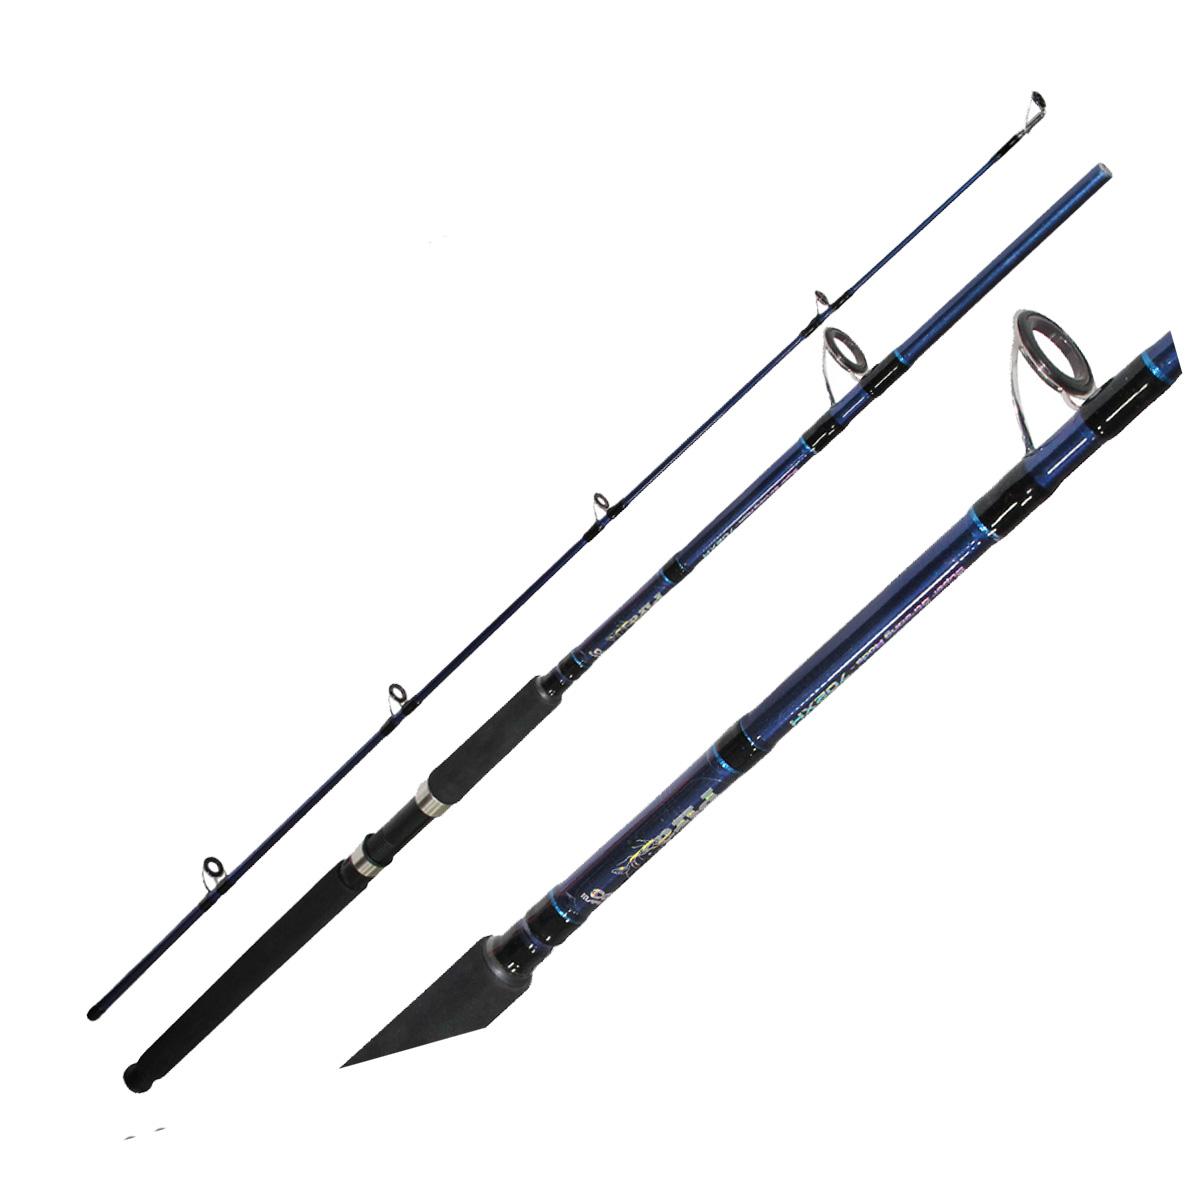 Vara Maruri Pira p/ Molinete 2,13 m 80 lbs (2 partes)  - Pró Pesca Shop